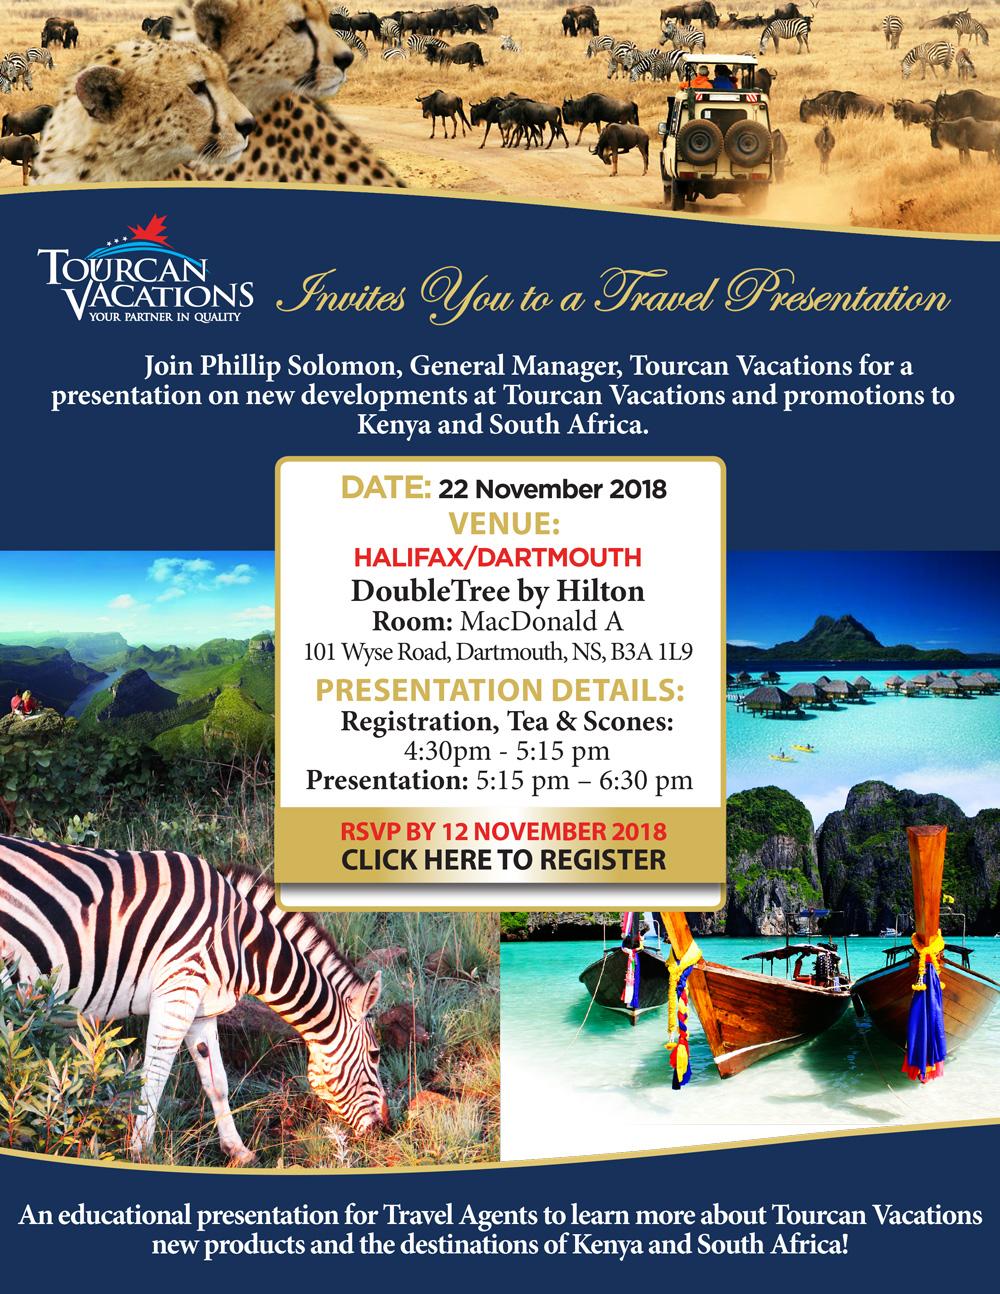 tourcan-2018-travel-presentation-invite-tourcan-vacations-halifax-jpg